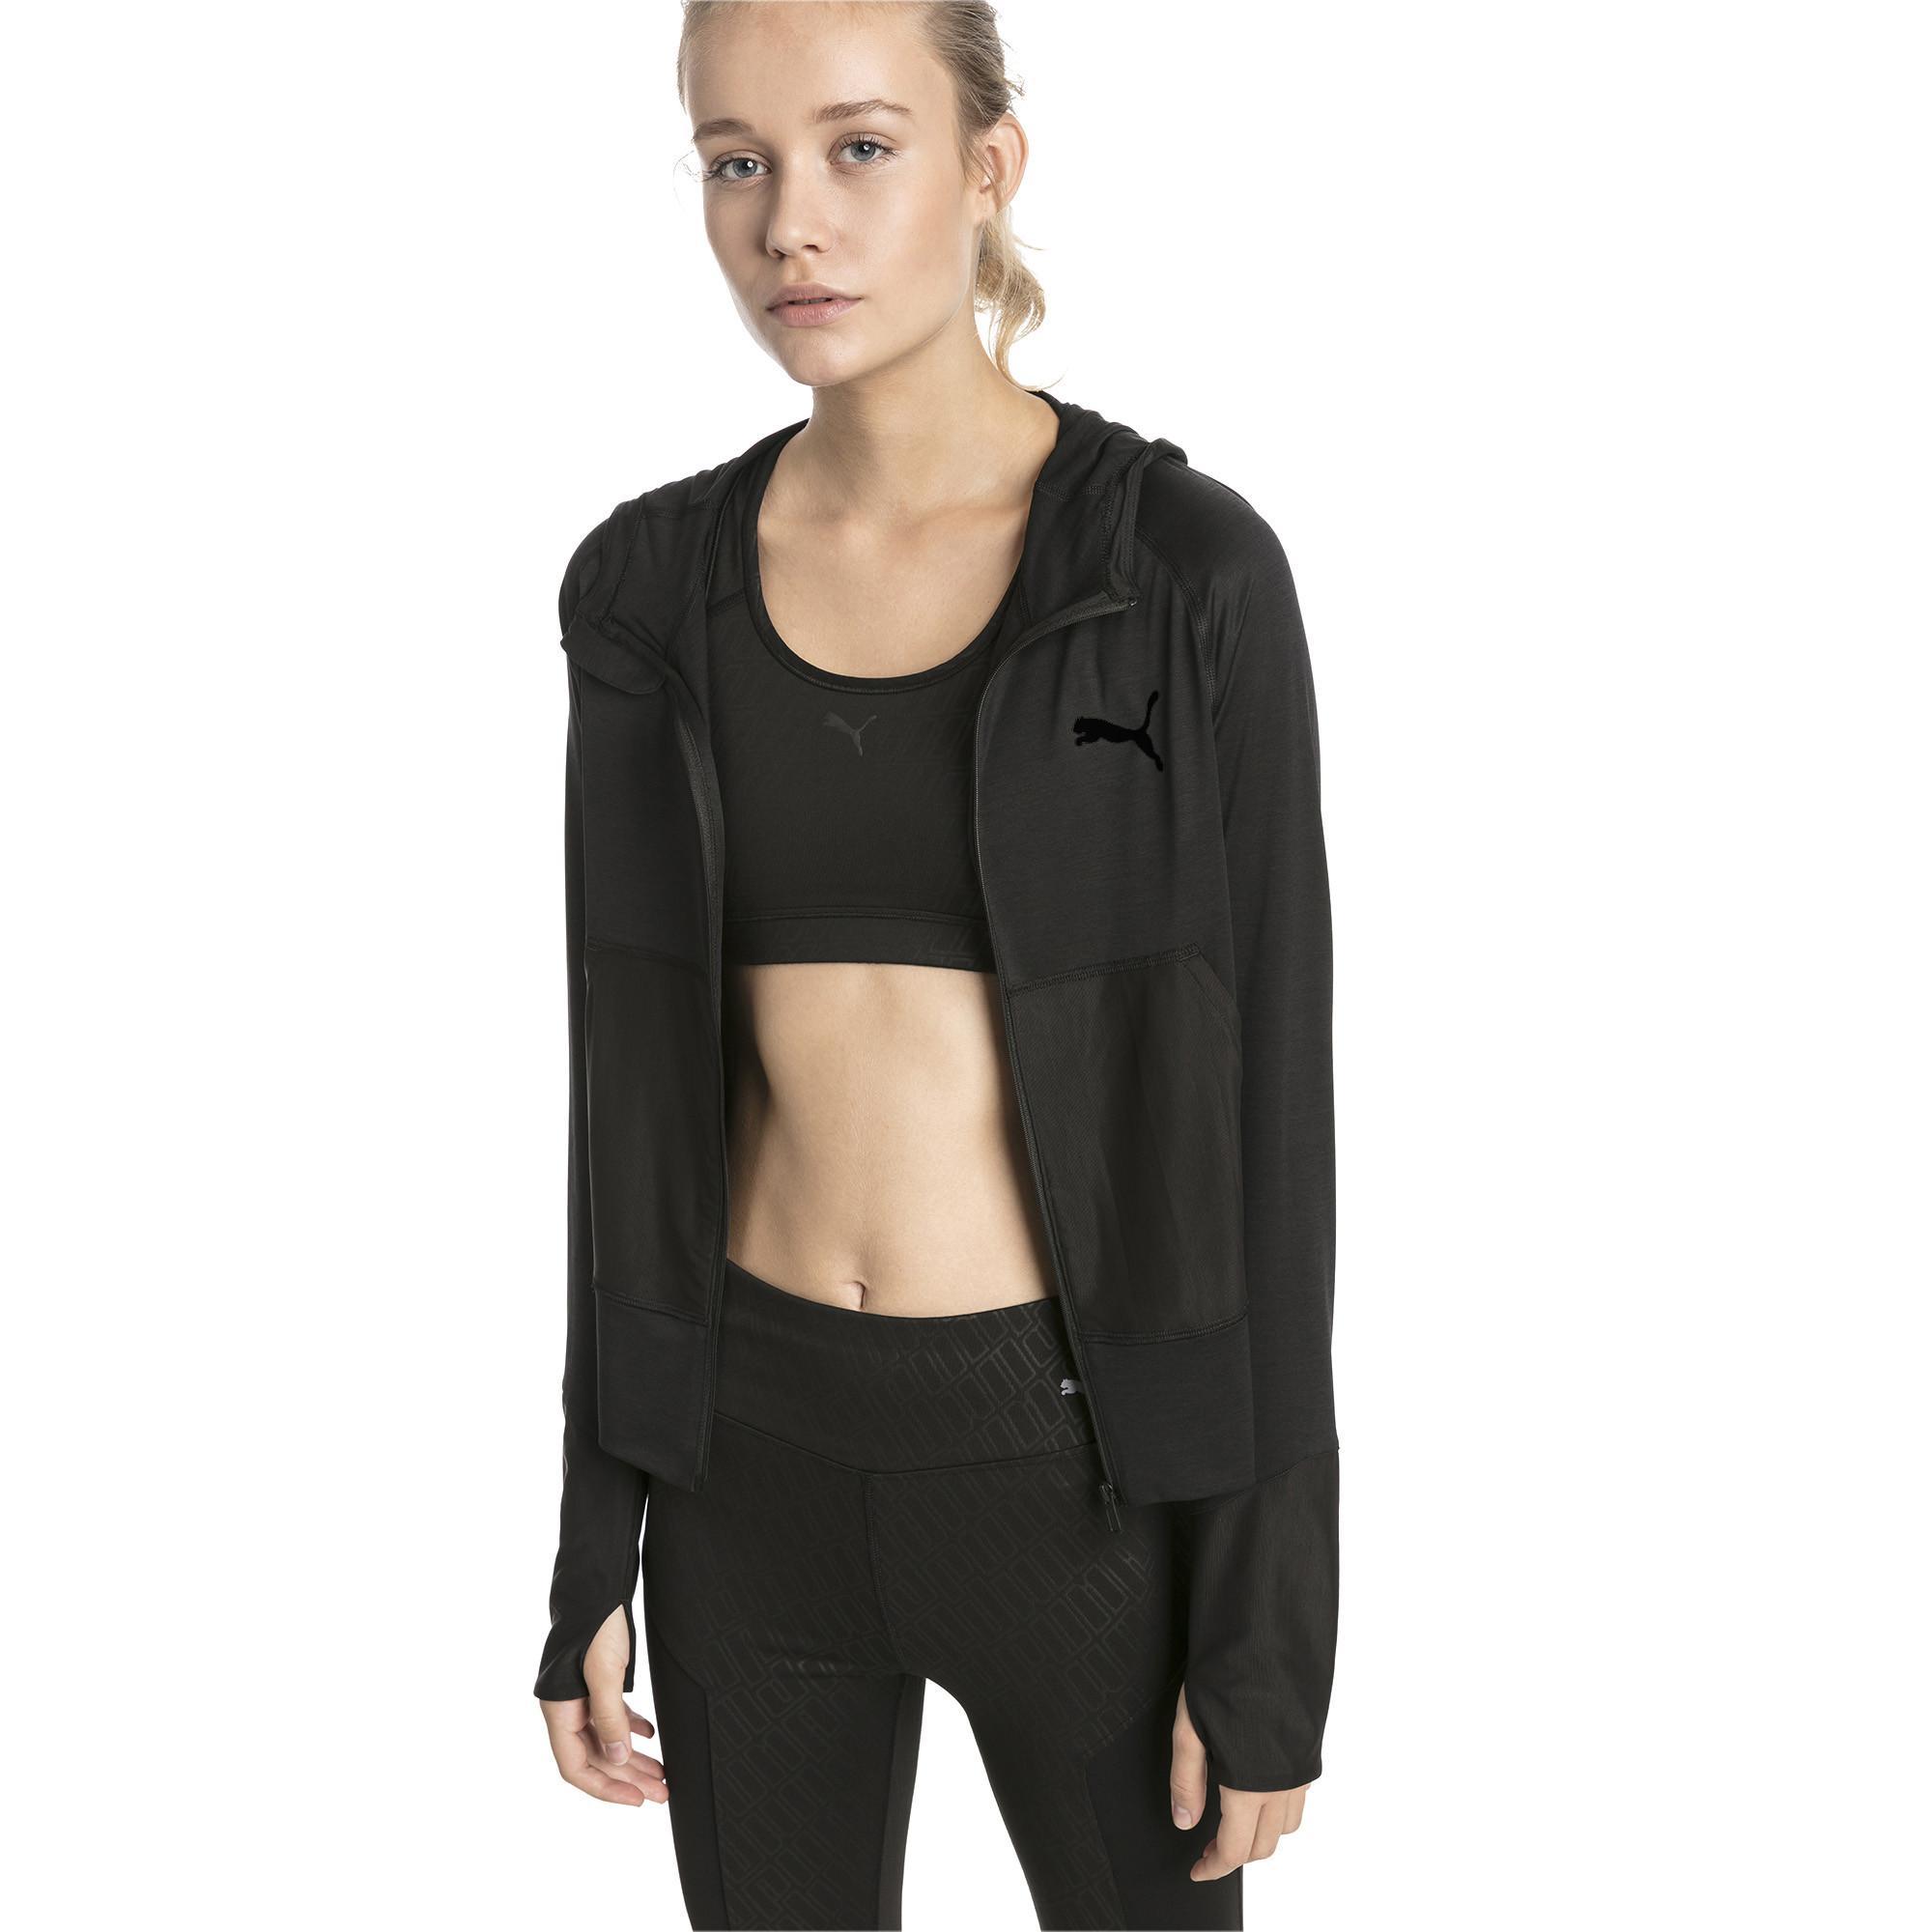 6308d8e9b4 Latest PUMA,Timberland Women's Jackets Products | Enjoy Huge ...